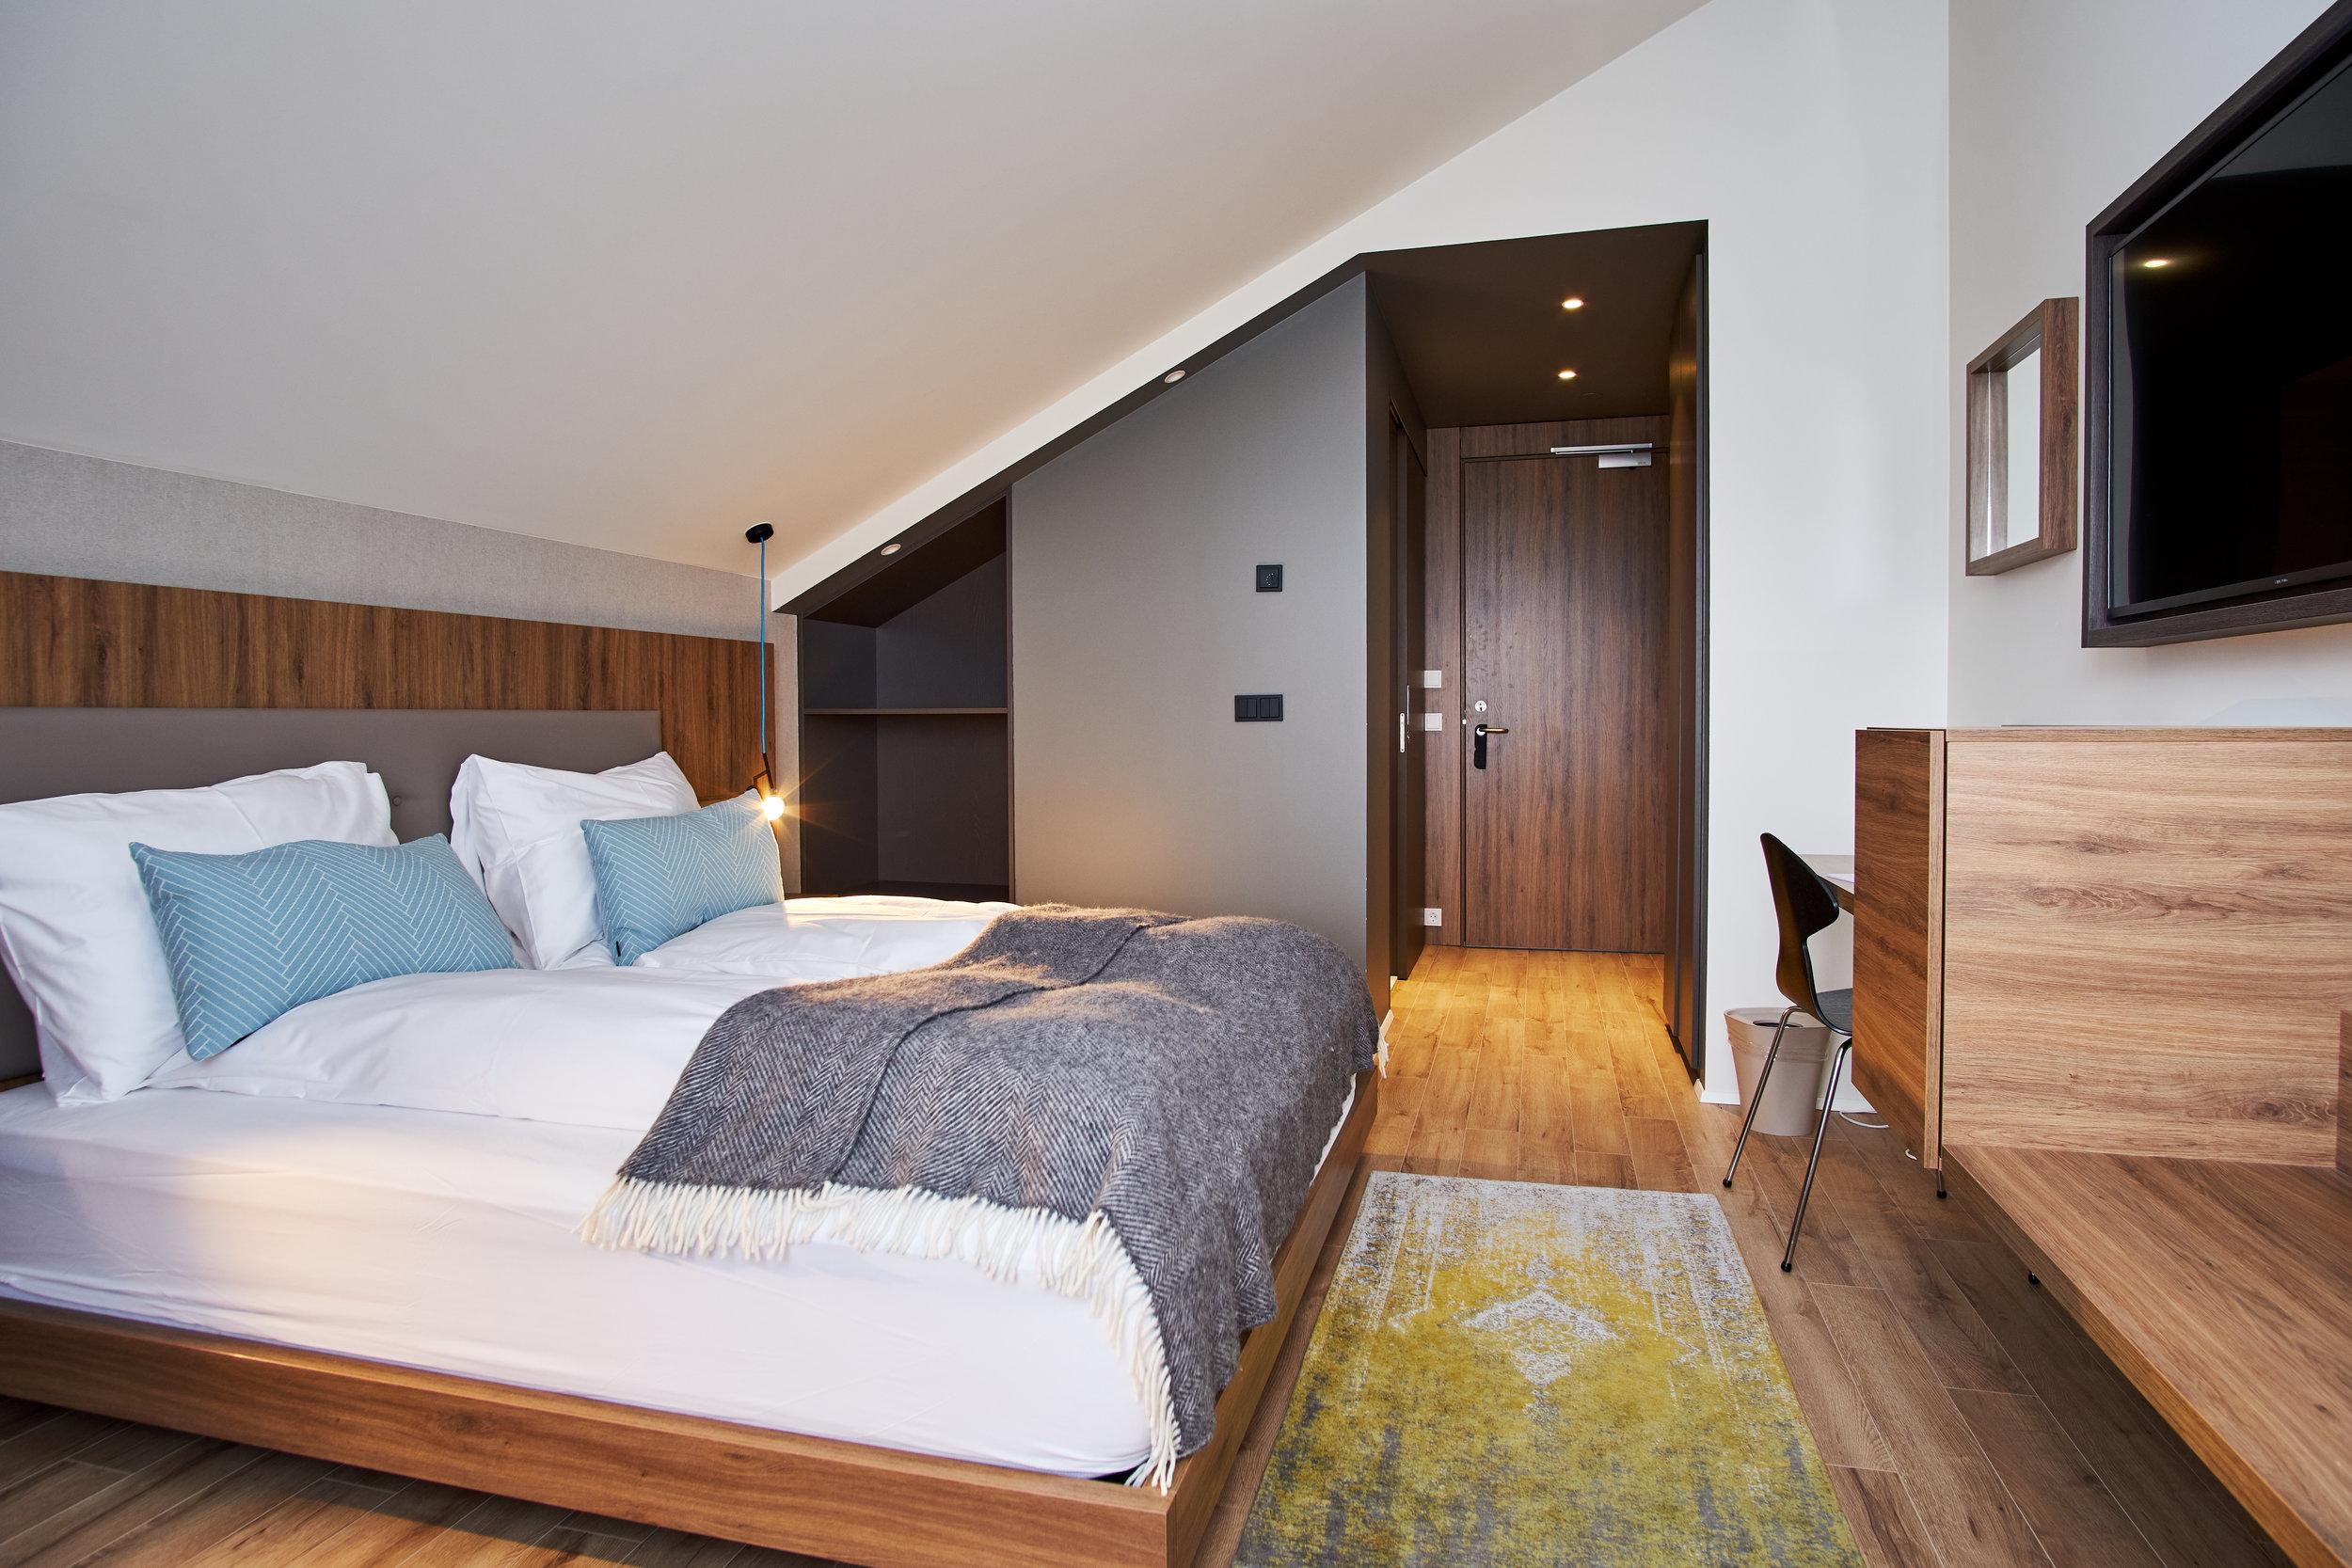 Cozy Bedrooms - Elegant rooms furnished with Scandinavian and Icelandic design